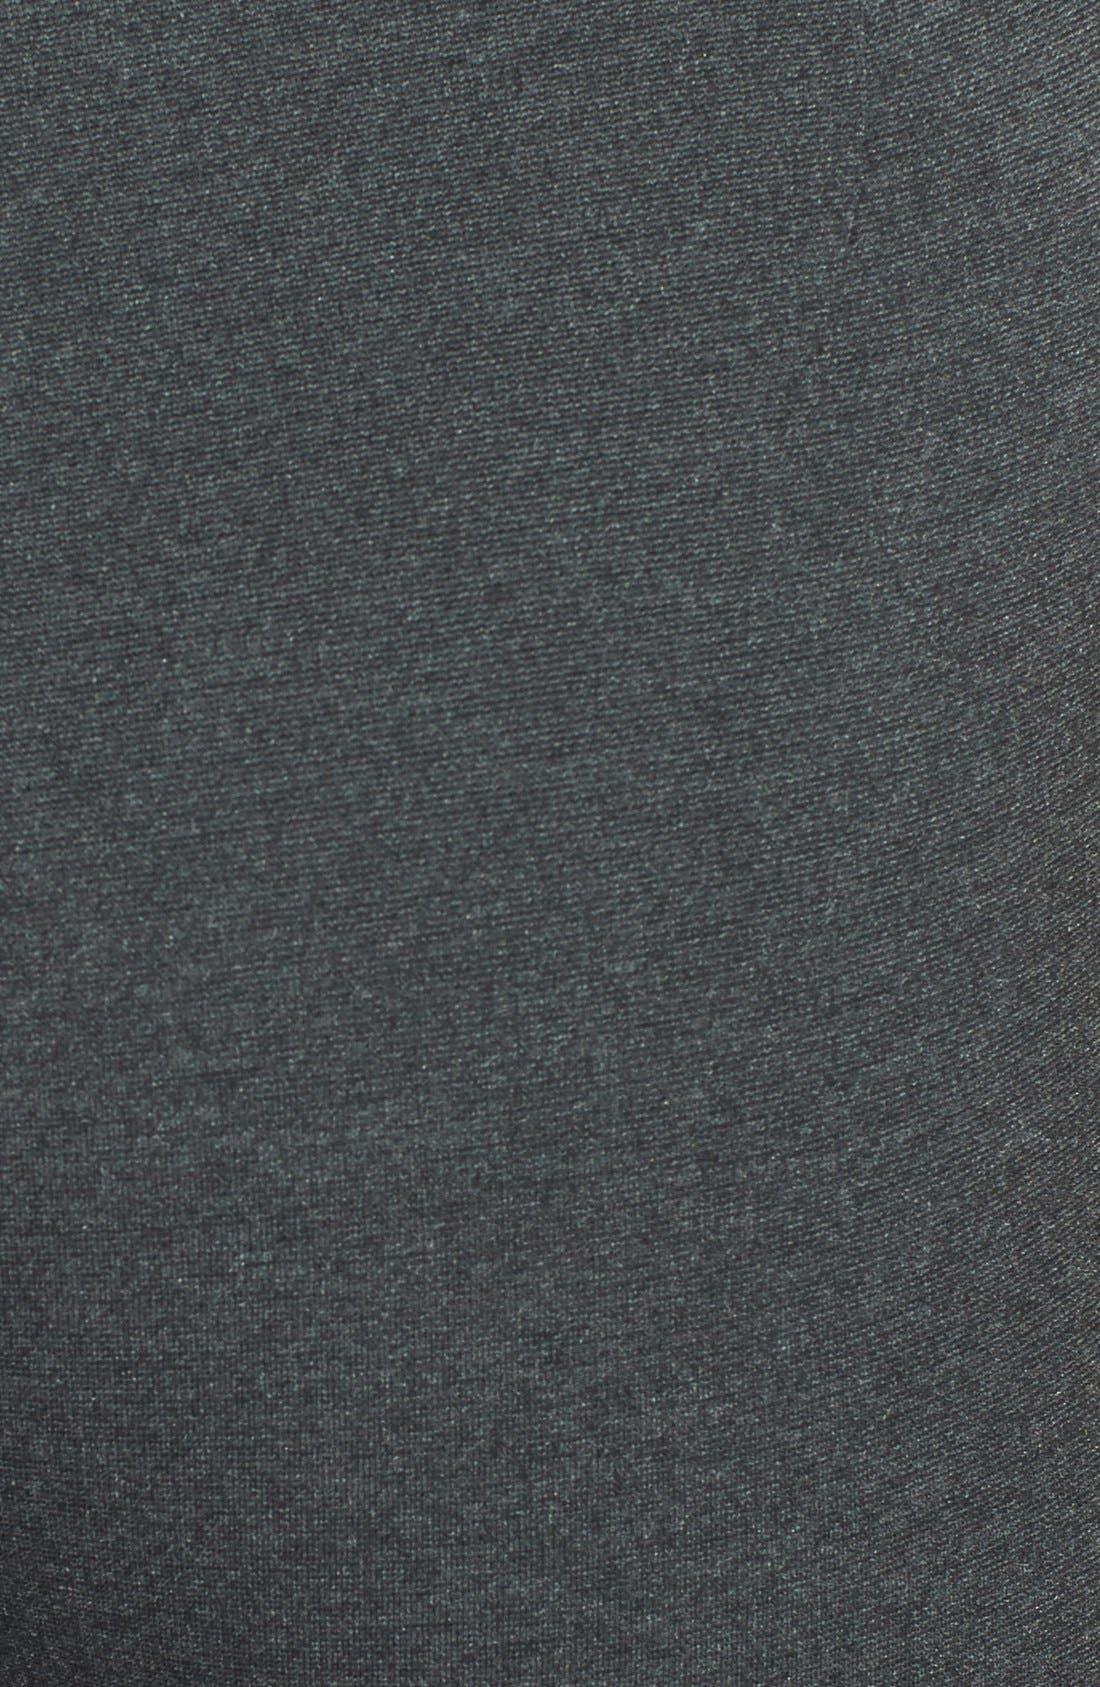 Alternate Image 3  - Eileen Fisher Slim Knit Ankle Pants (Regular & Petite)